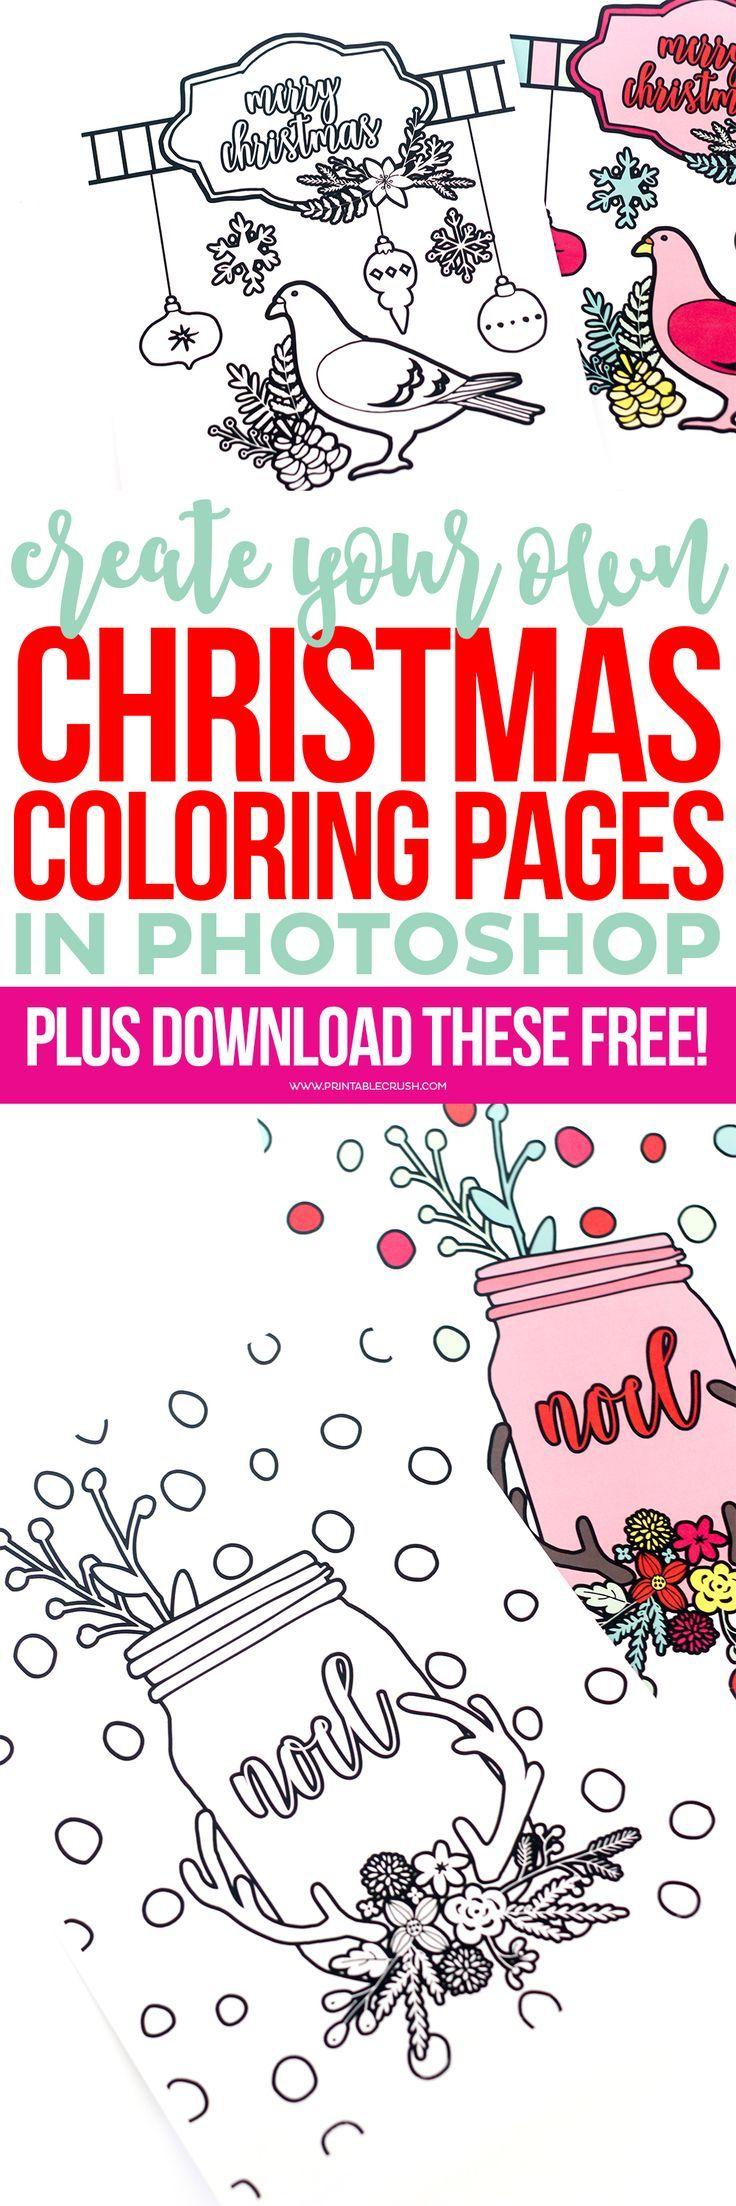 55 best DESIGN INSPIRATION images on Pinterest | Combination colors ...